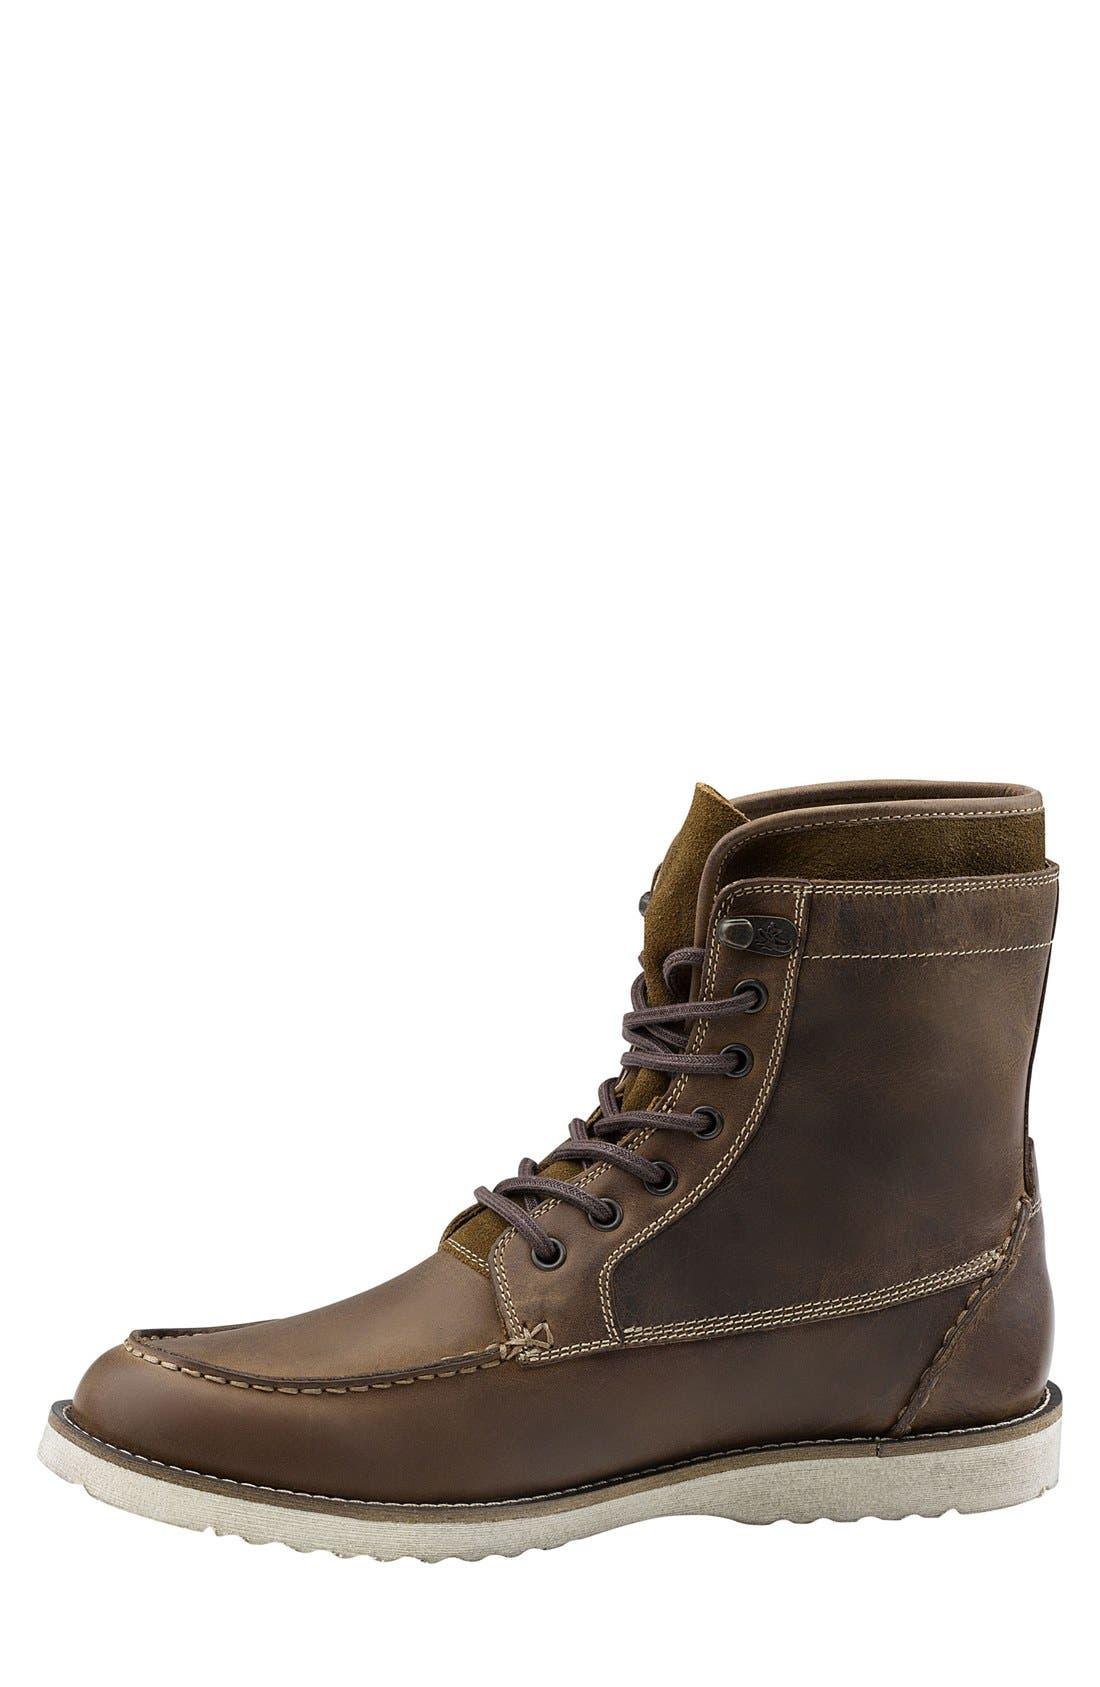 Moc Toe Boot,                             Alternate thumbnail 2, color,                             Dark Tan